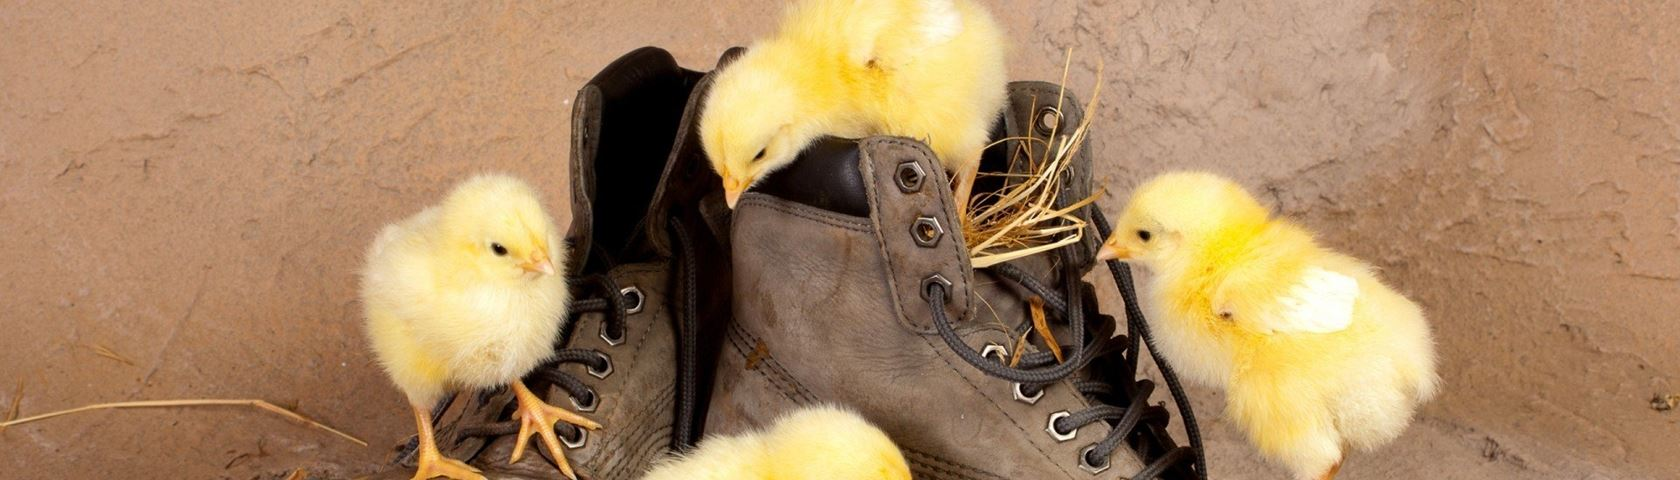 Tiny Chicks